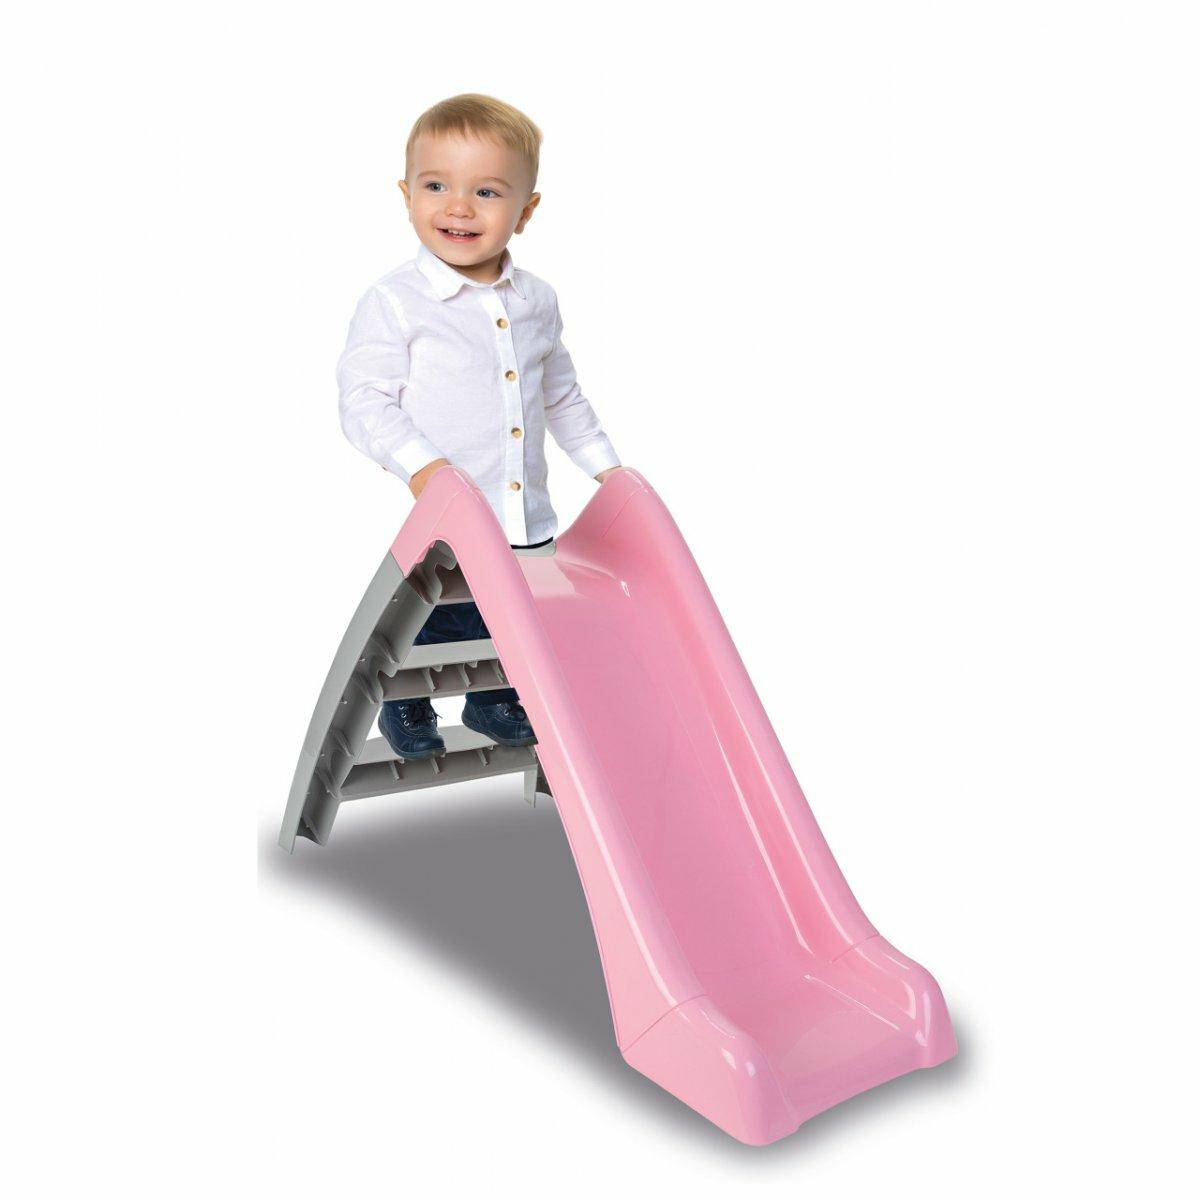 JAMARA Rutsche Happy Slide pastellrosa 1+